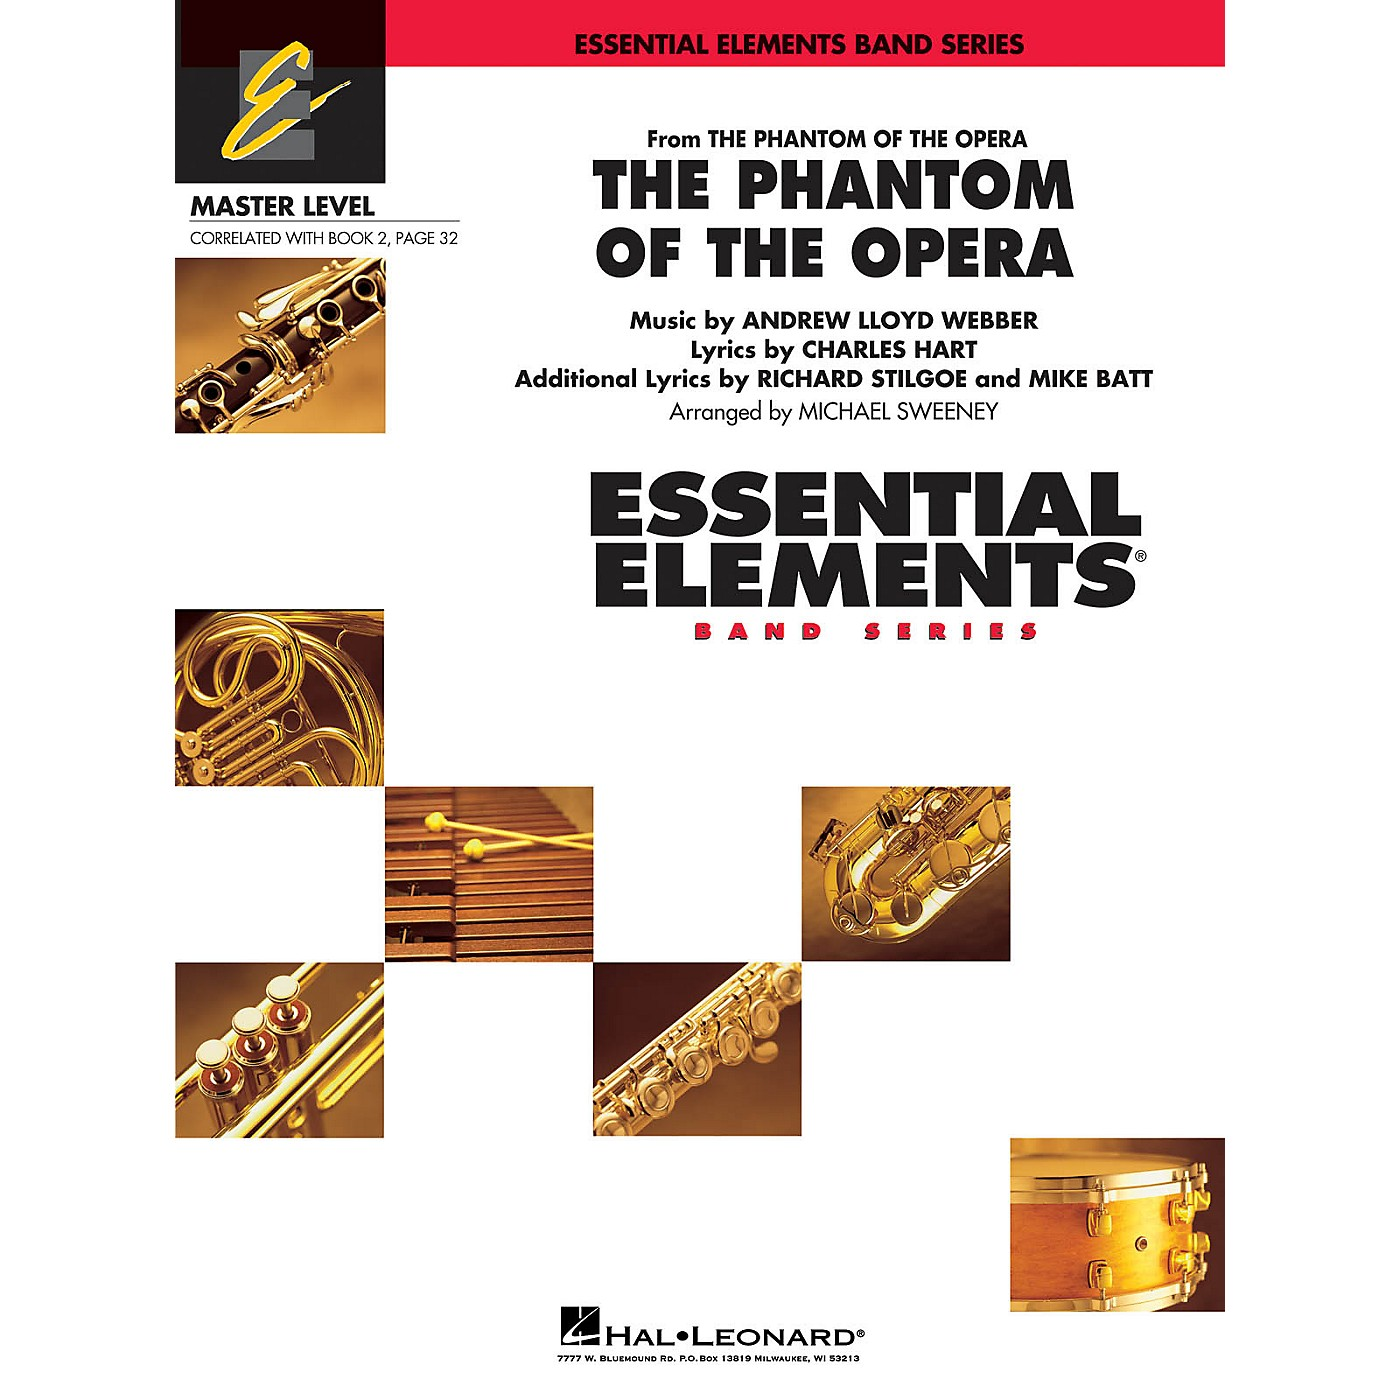 Hal Leonard The Phantom of the Opera (Main Theme) Concert Band Level 2 Arranged by Michael Sweeney thumbnail